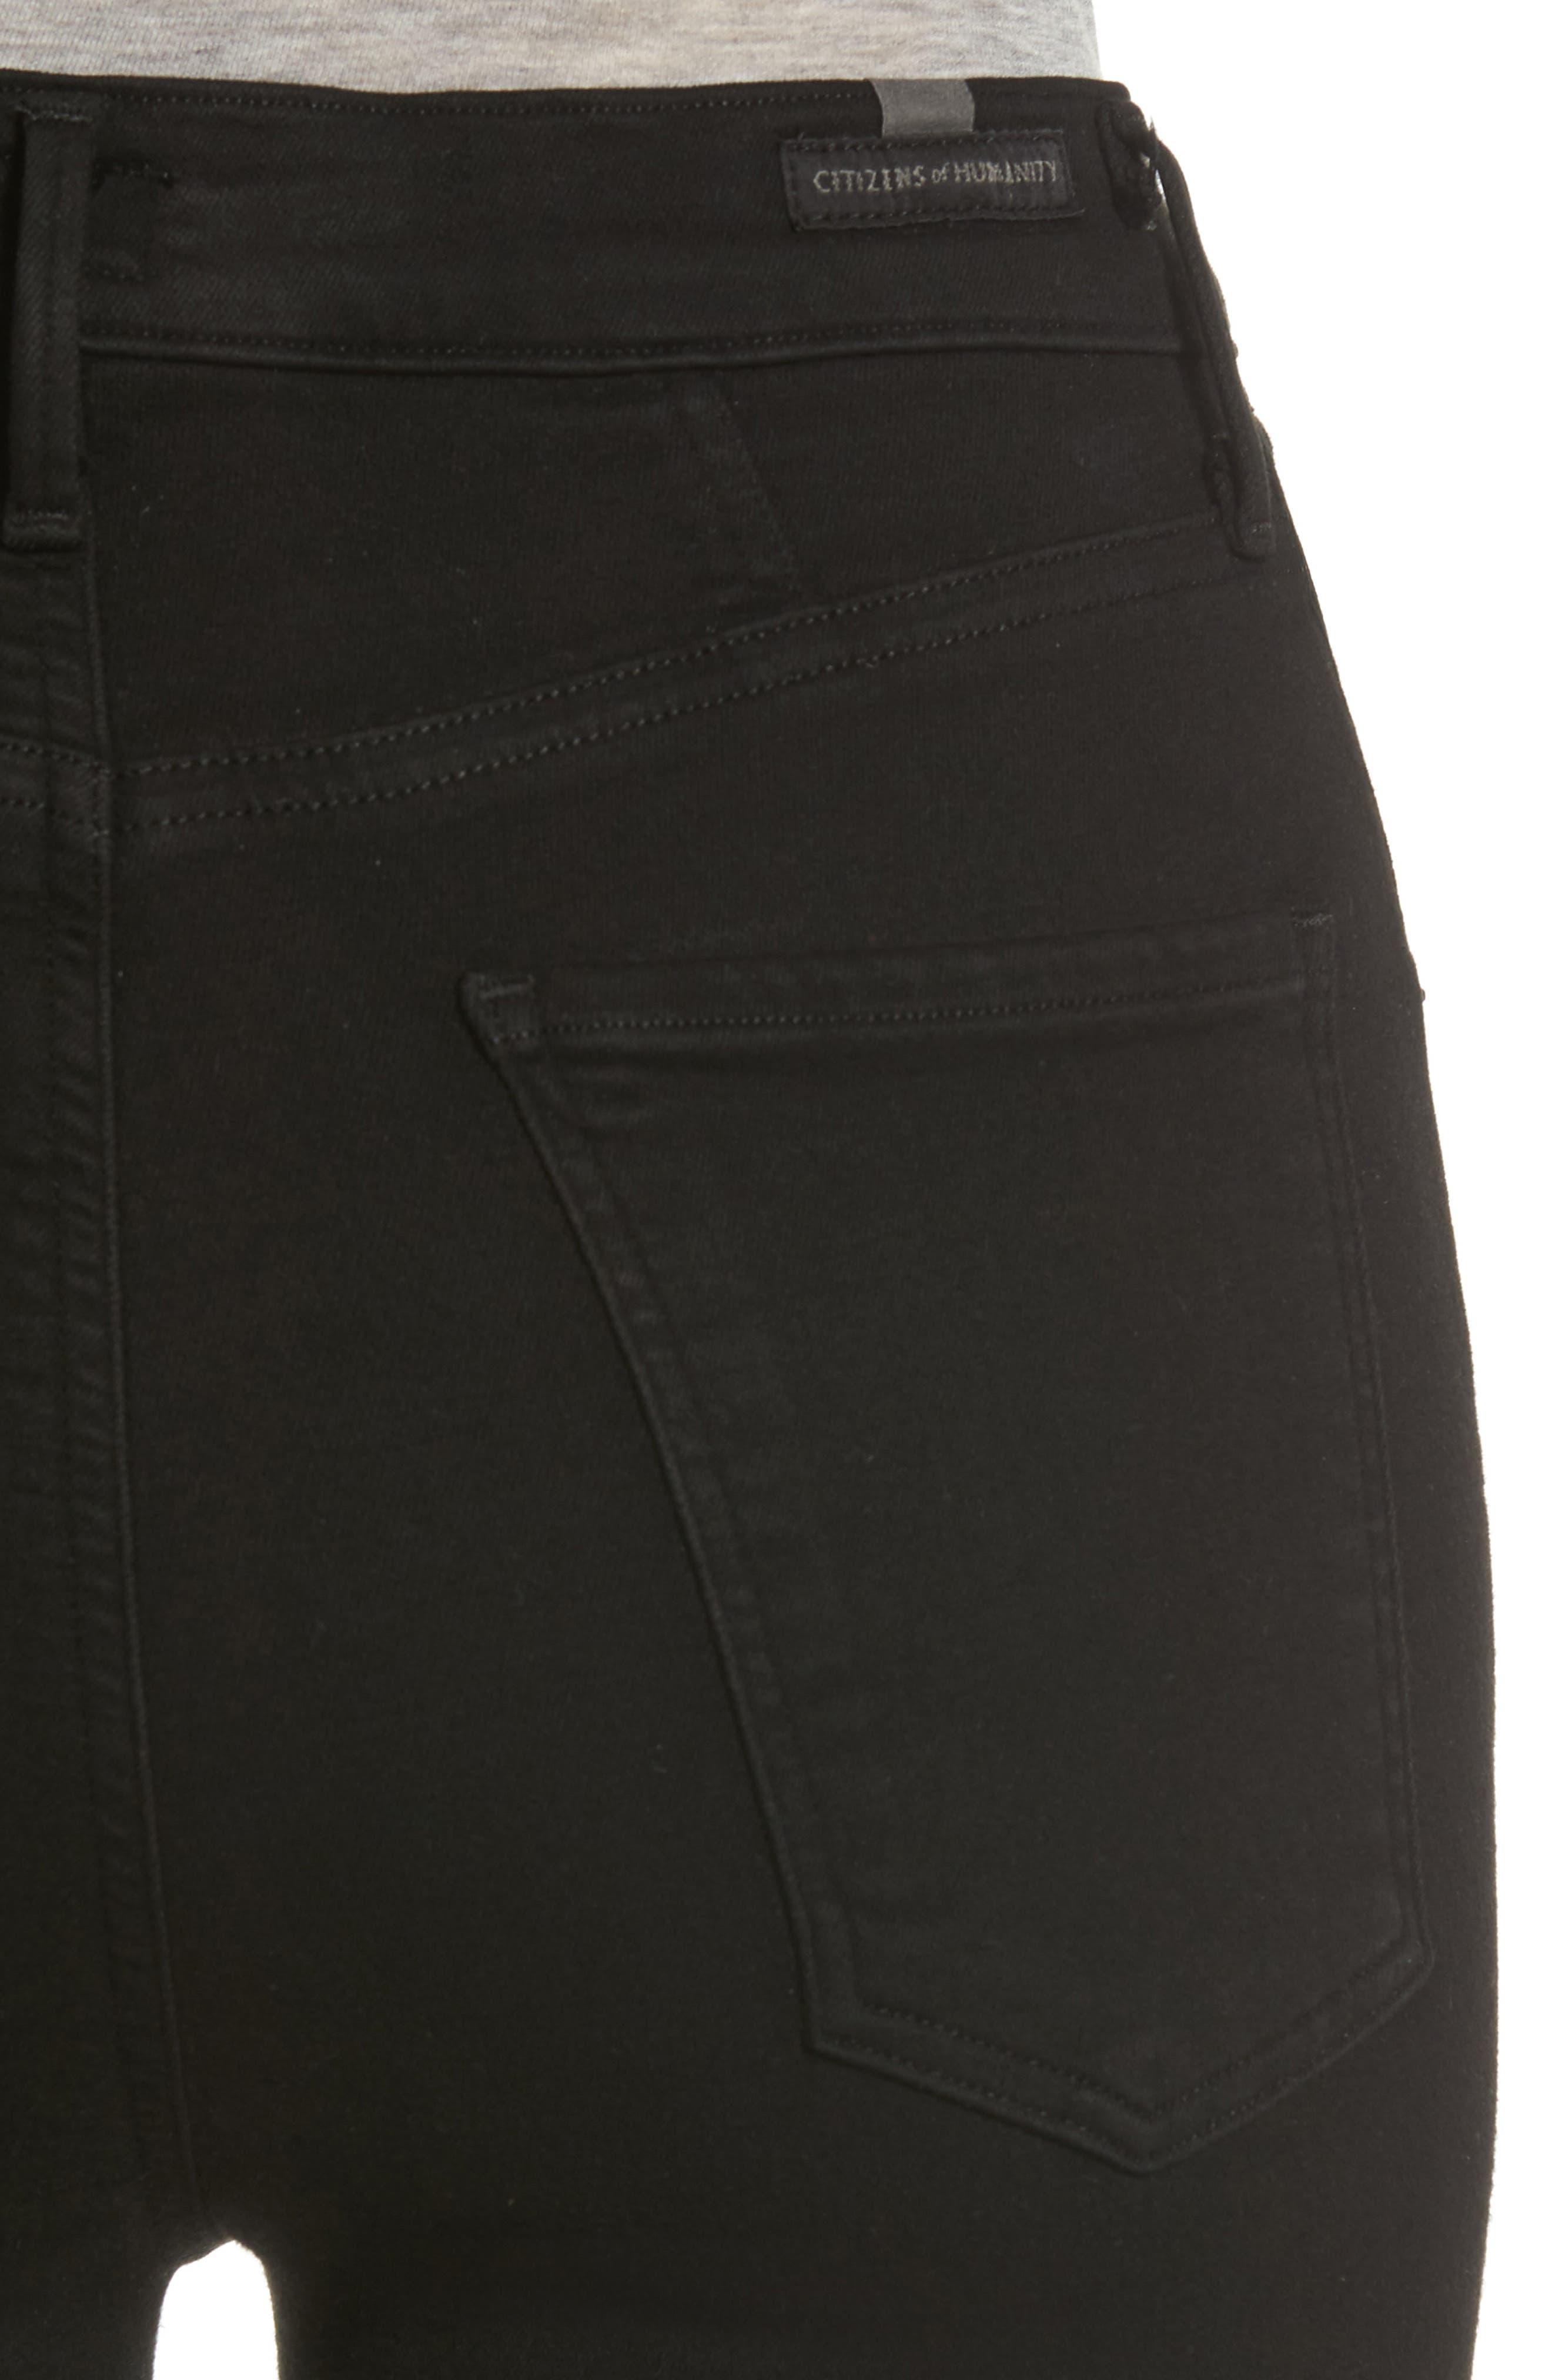 Chrissy High Waist Skinny Jeans,                             Alternate thumbnail 4, color,                             ALL BLACK